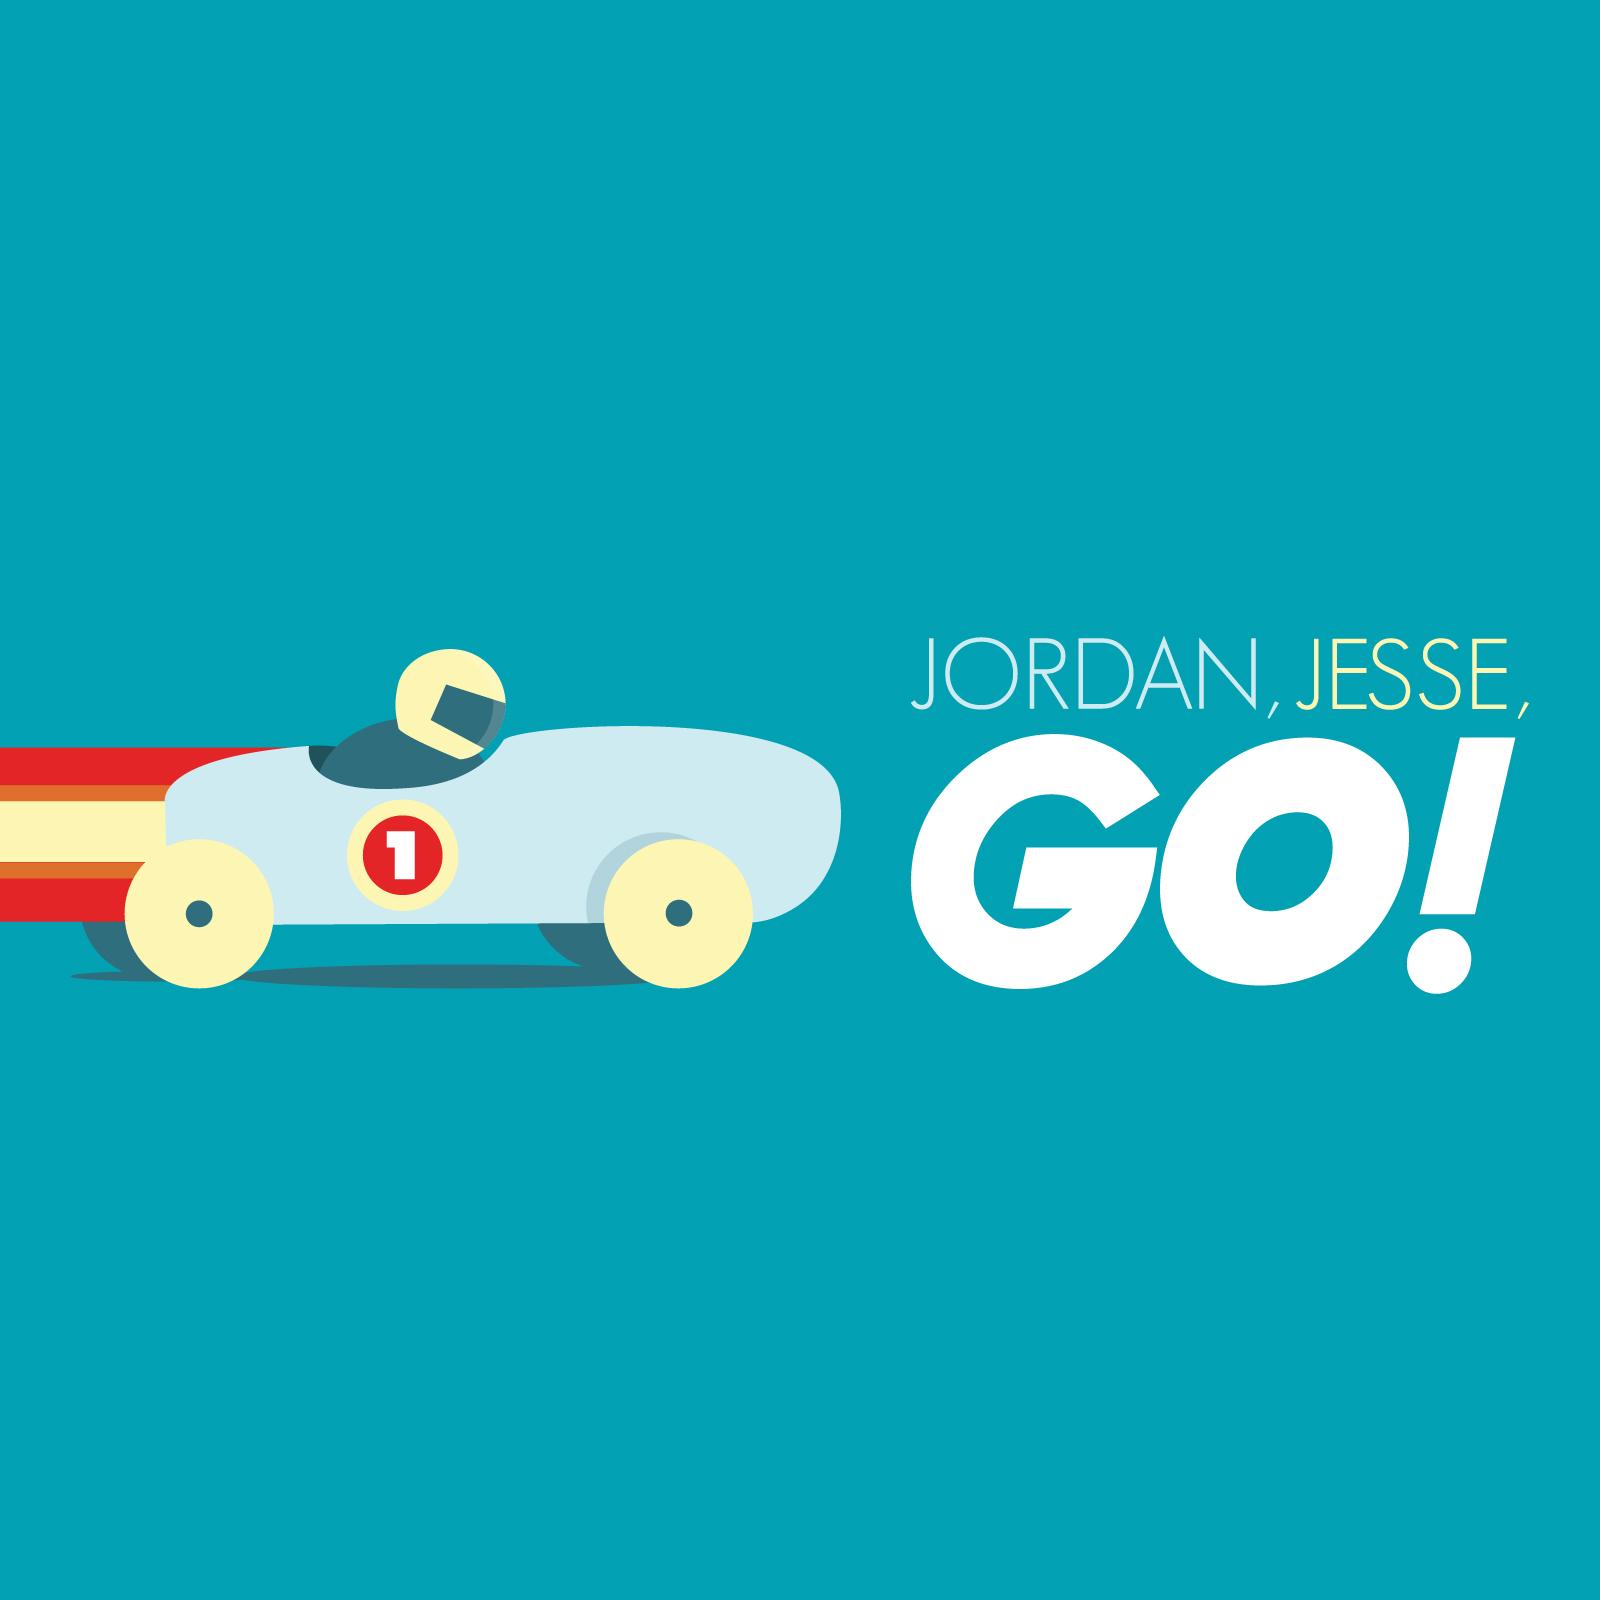 Jordan, Jesse GO!